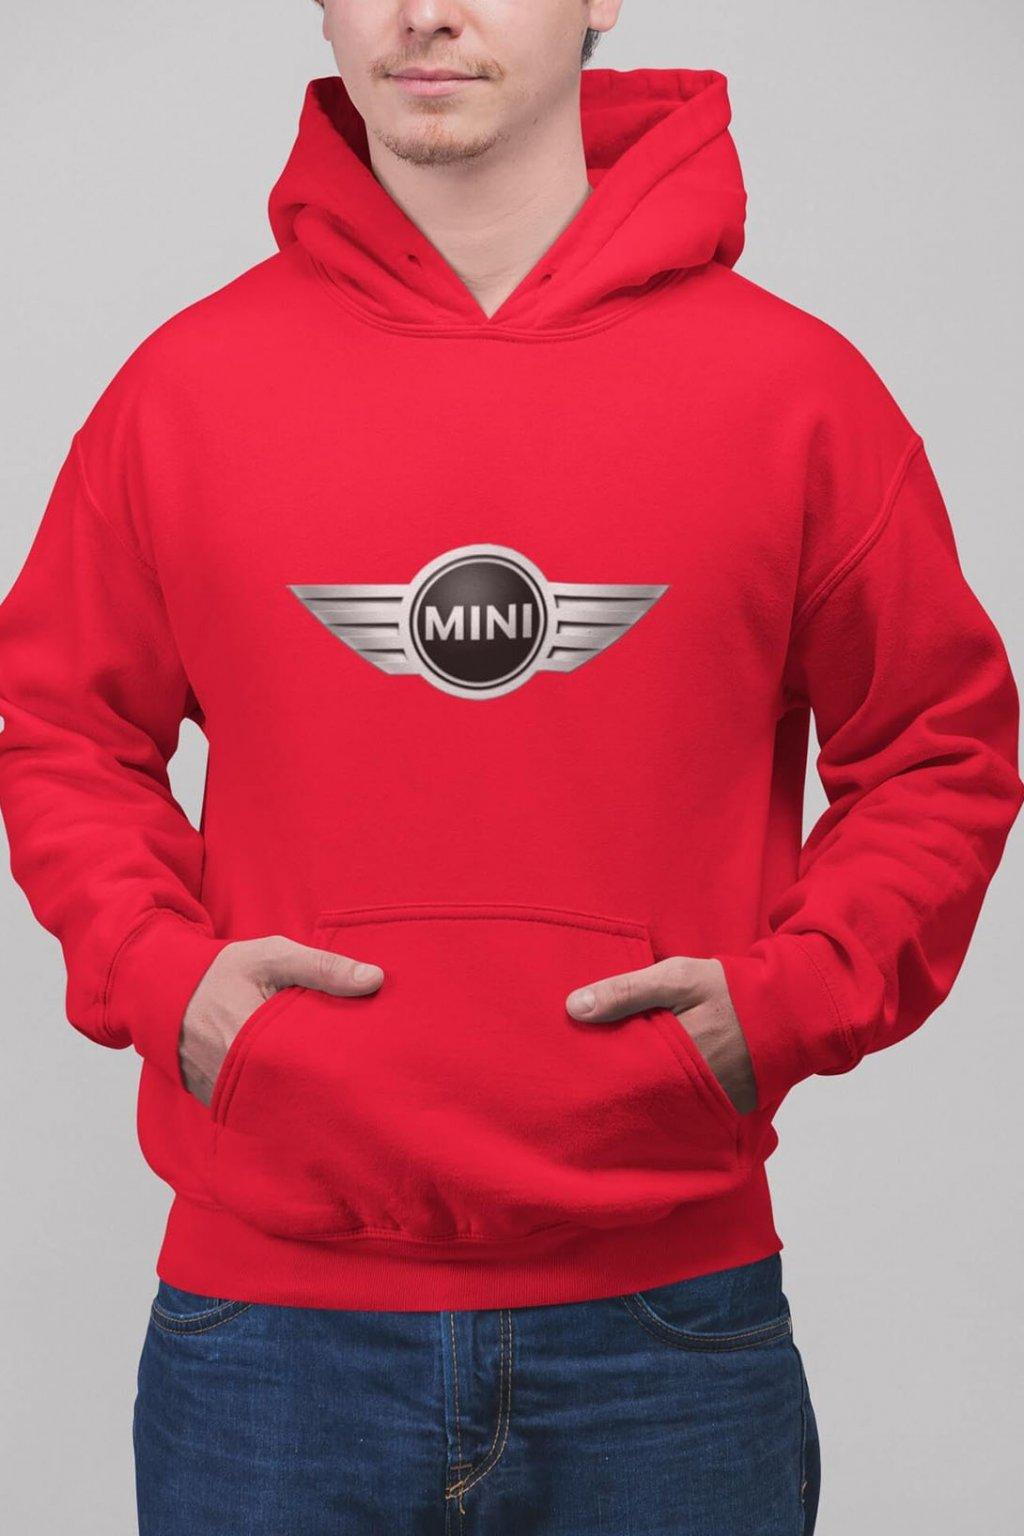 Pánska mikina s logom auta Mini